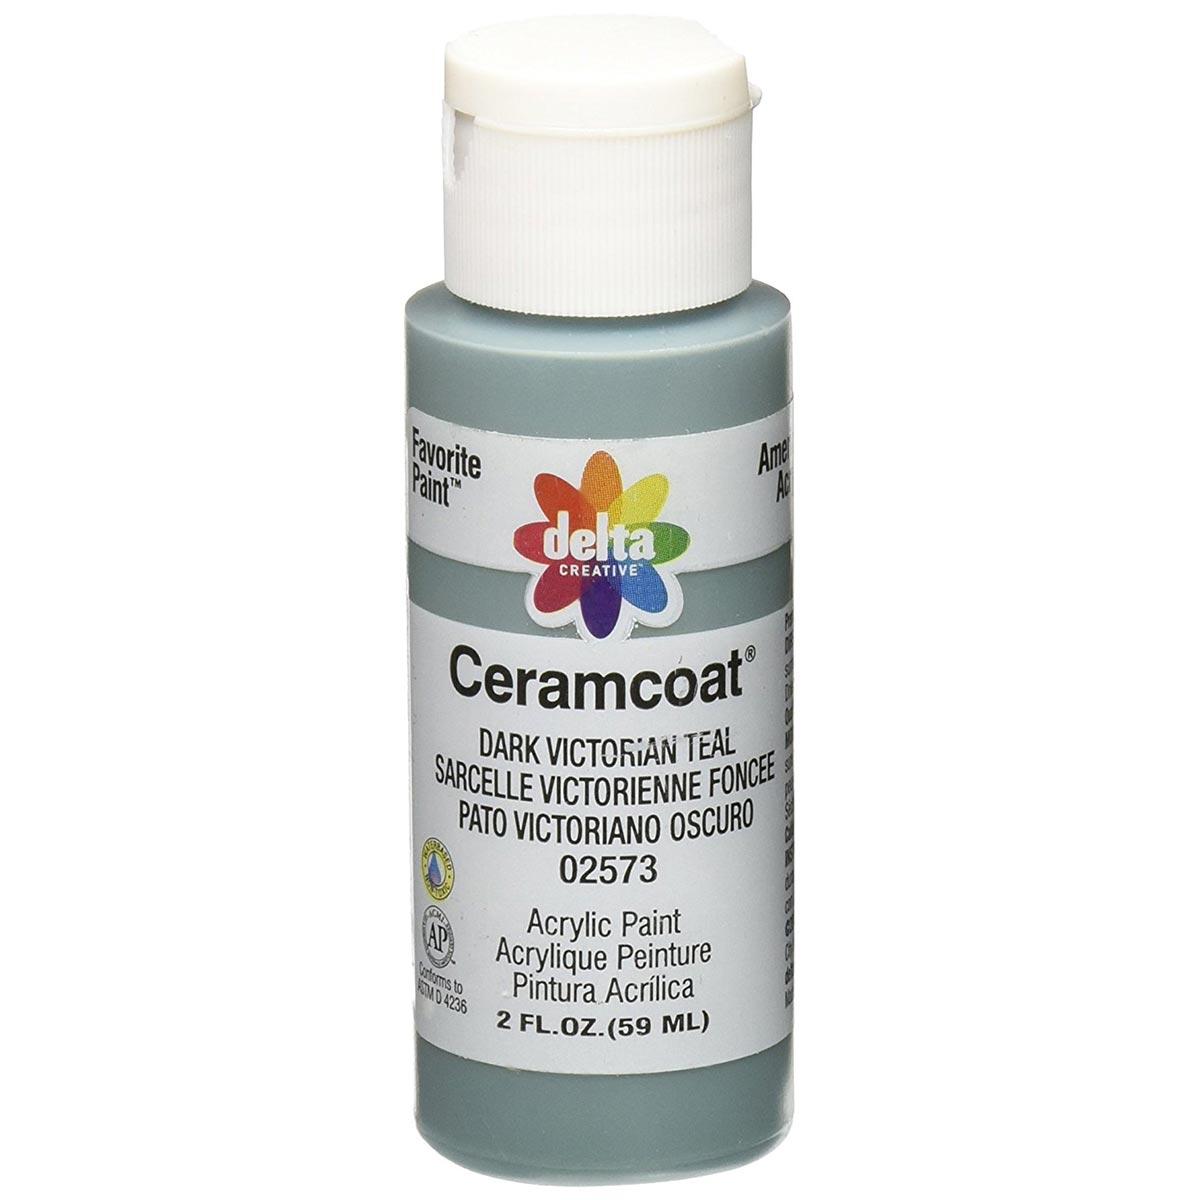 Delta Ceramcoat ® Acrylic Paint - Dark Victorian Teal, 2 oz.